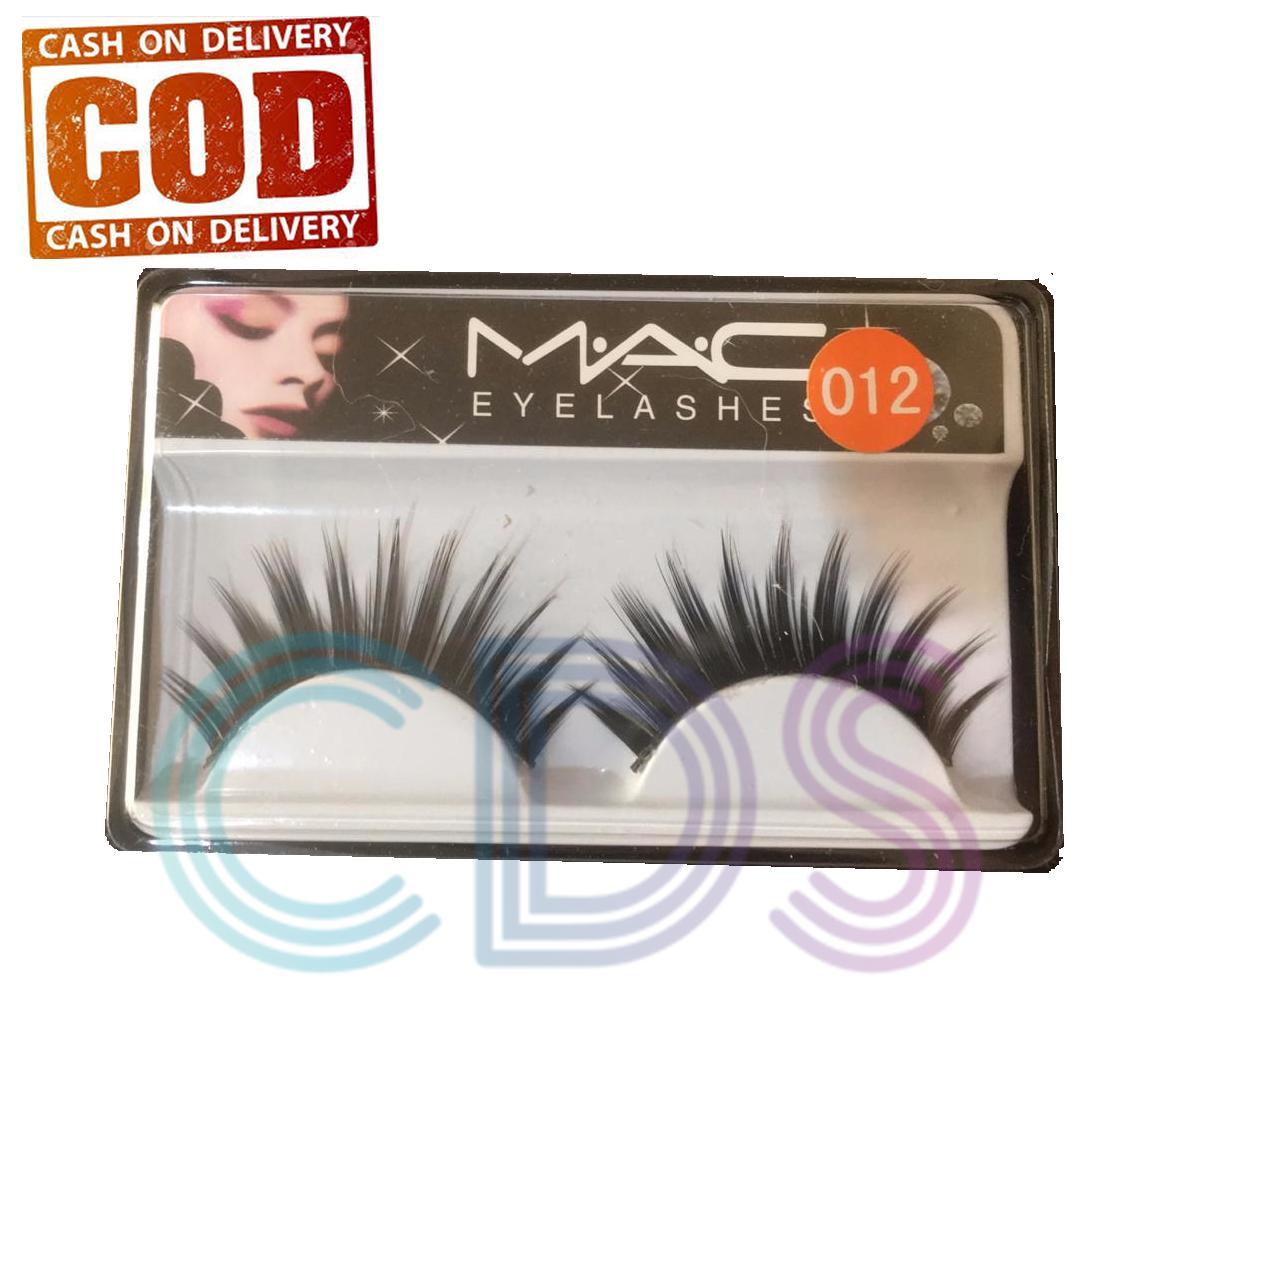 Bulu Mata Palsu Eyelash Natural Mac Eyelashes 012